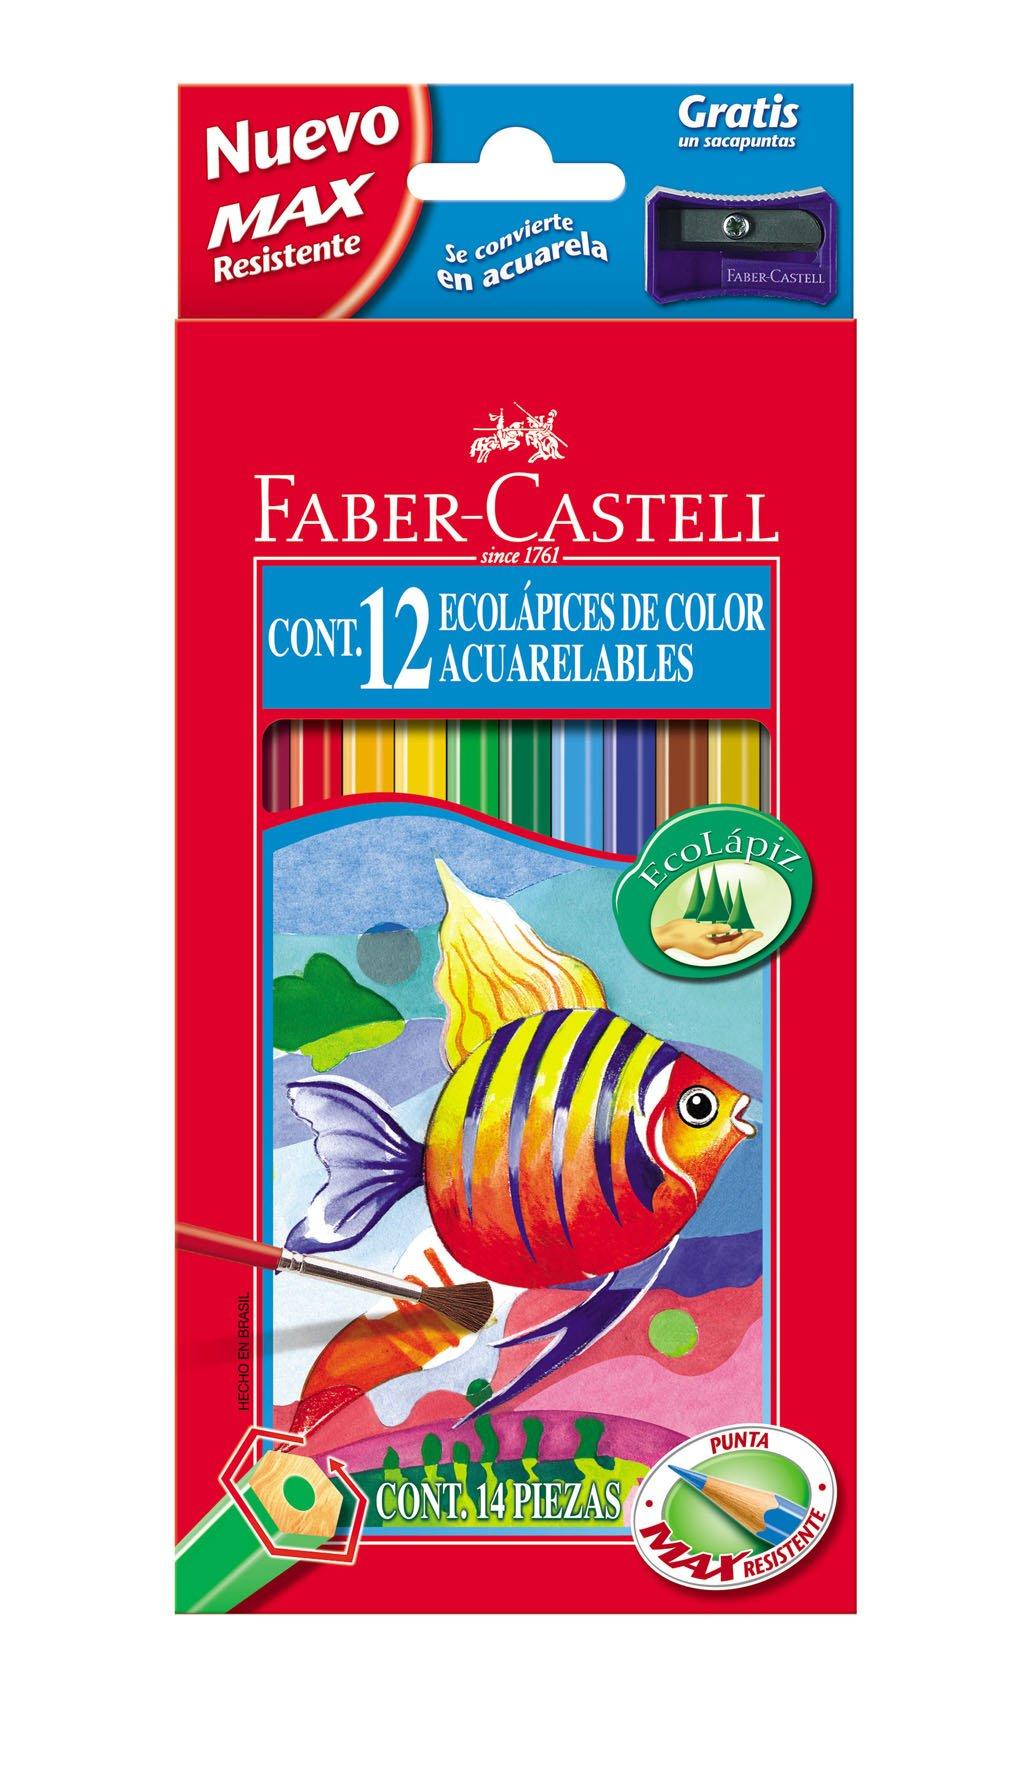 Faber-Castell 120212 – Estuche de 12 ecolápices de color acuarelable, 1 pincel y afilalápices de regalo